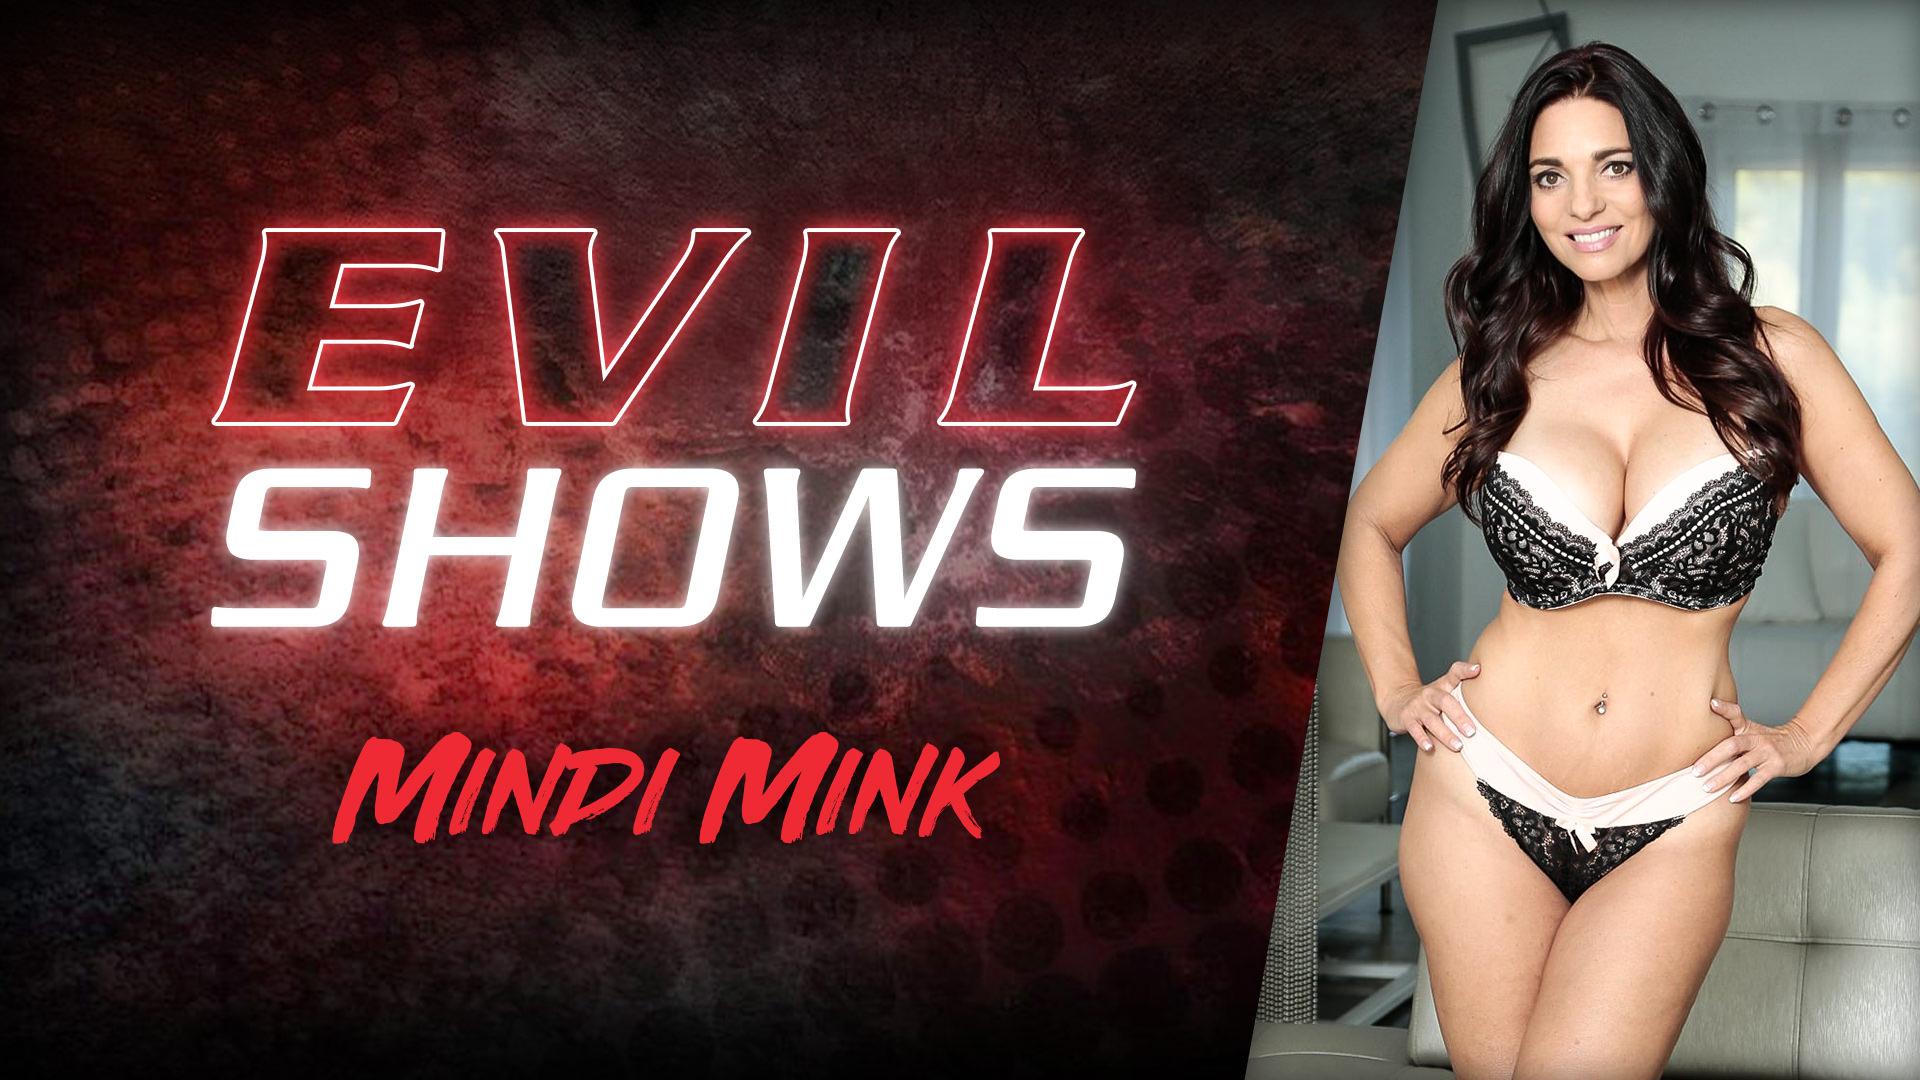 Evil Shows - Mindi Mink Scena 1